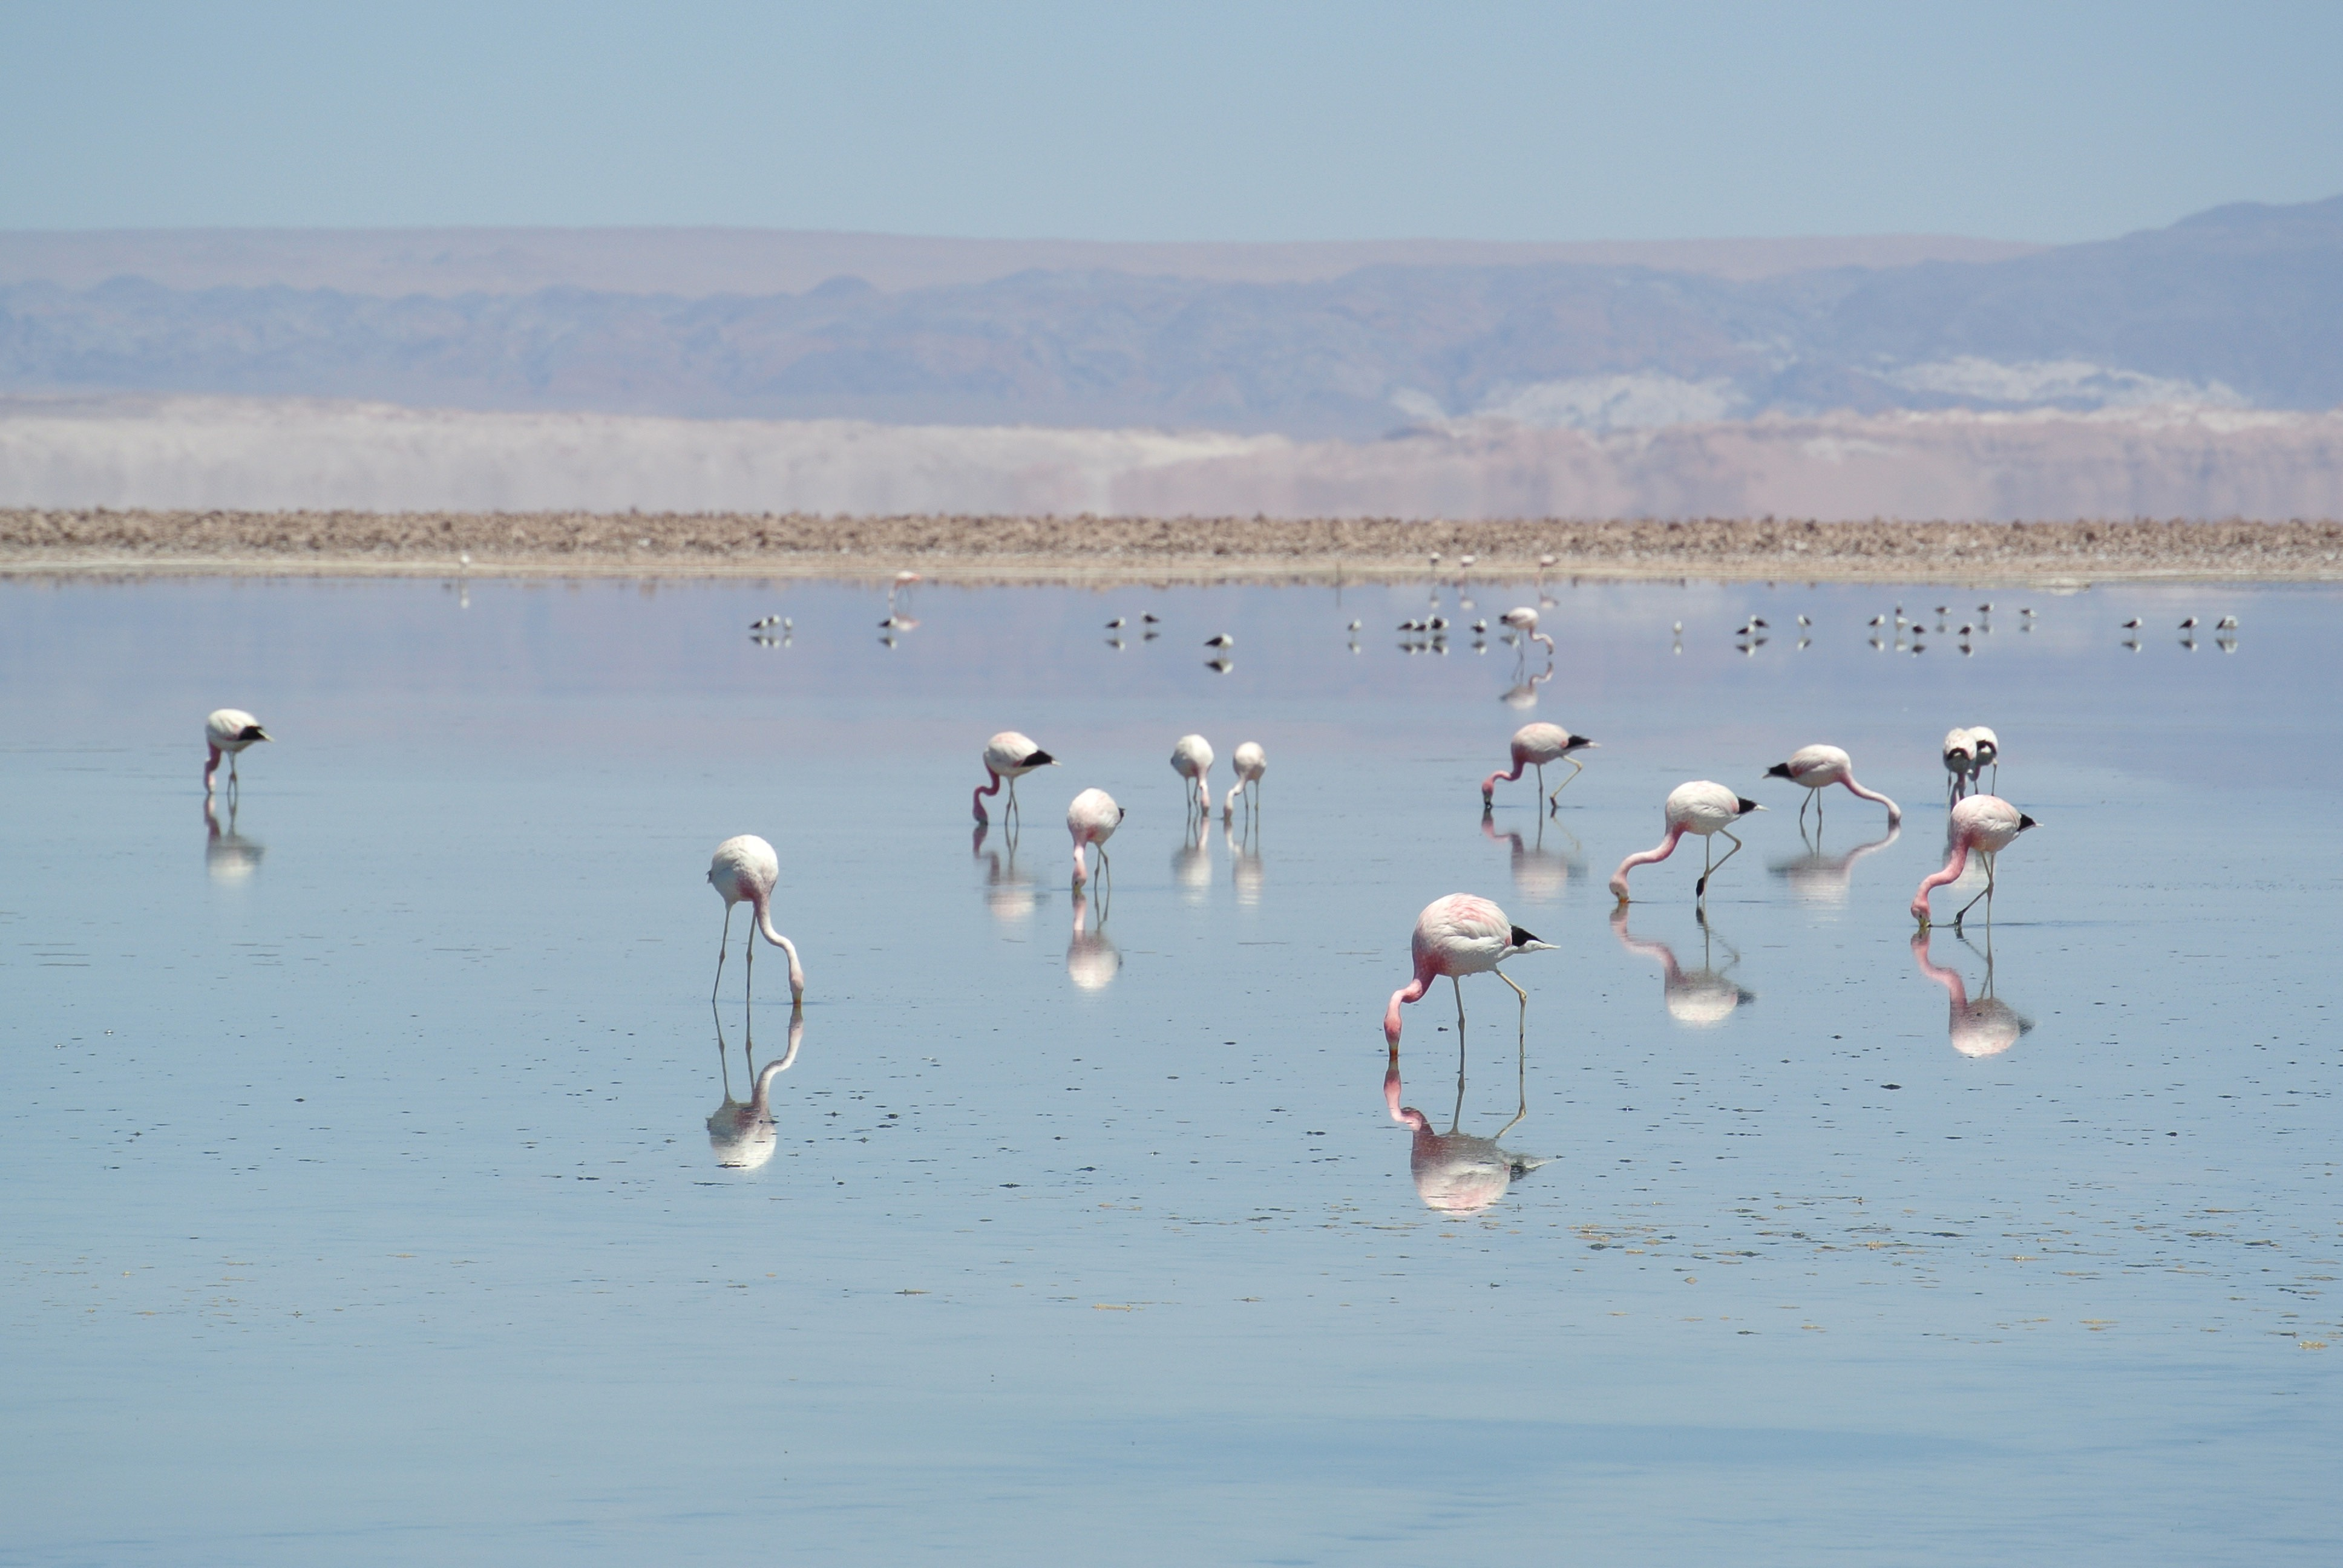 015 0912 Mirador - Salar de Atacama 30jpeg